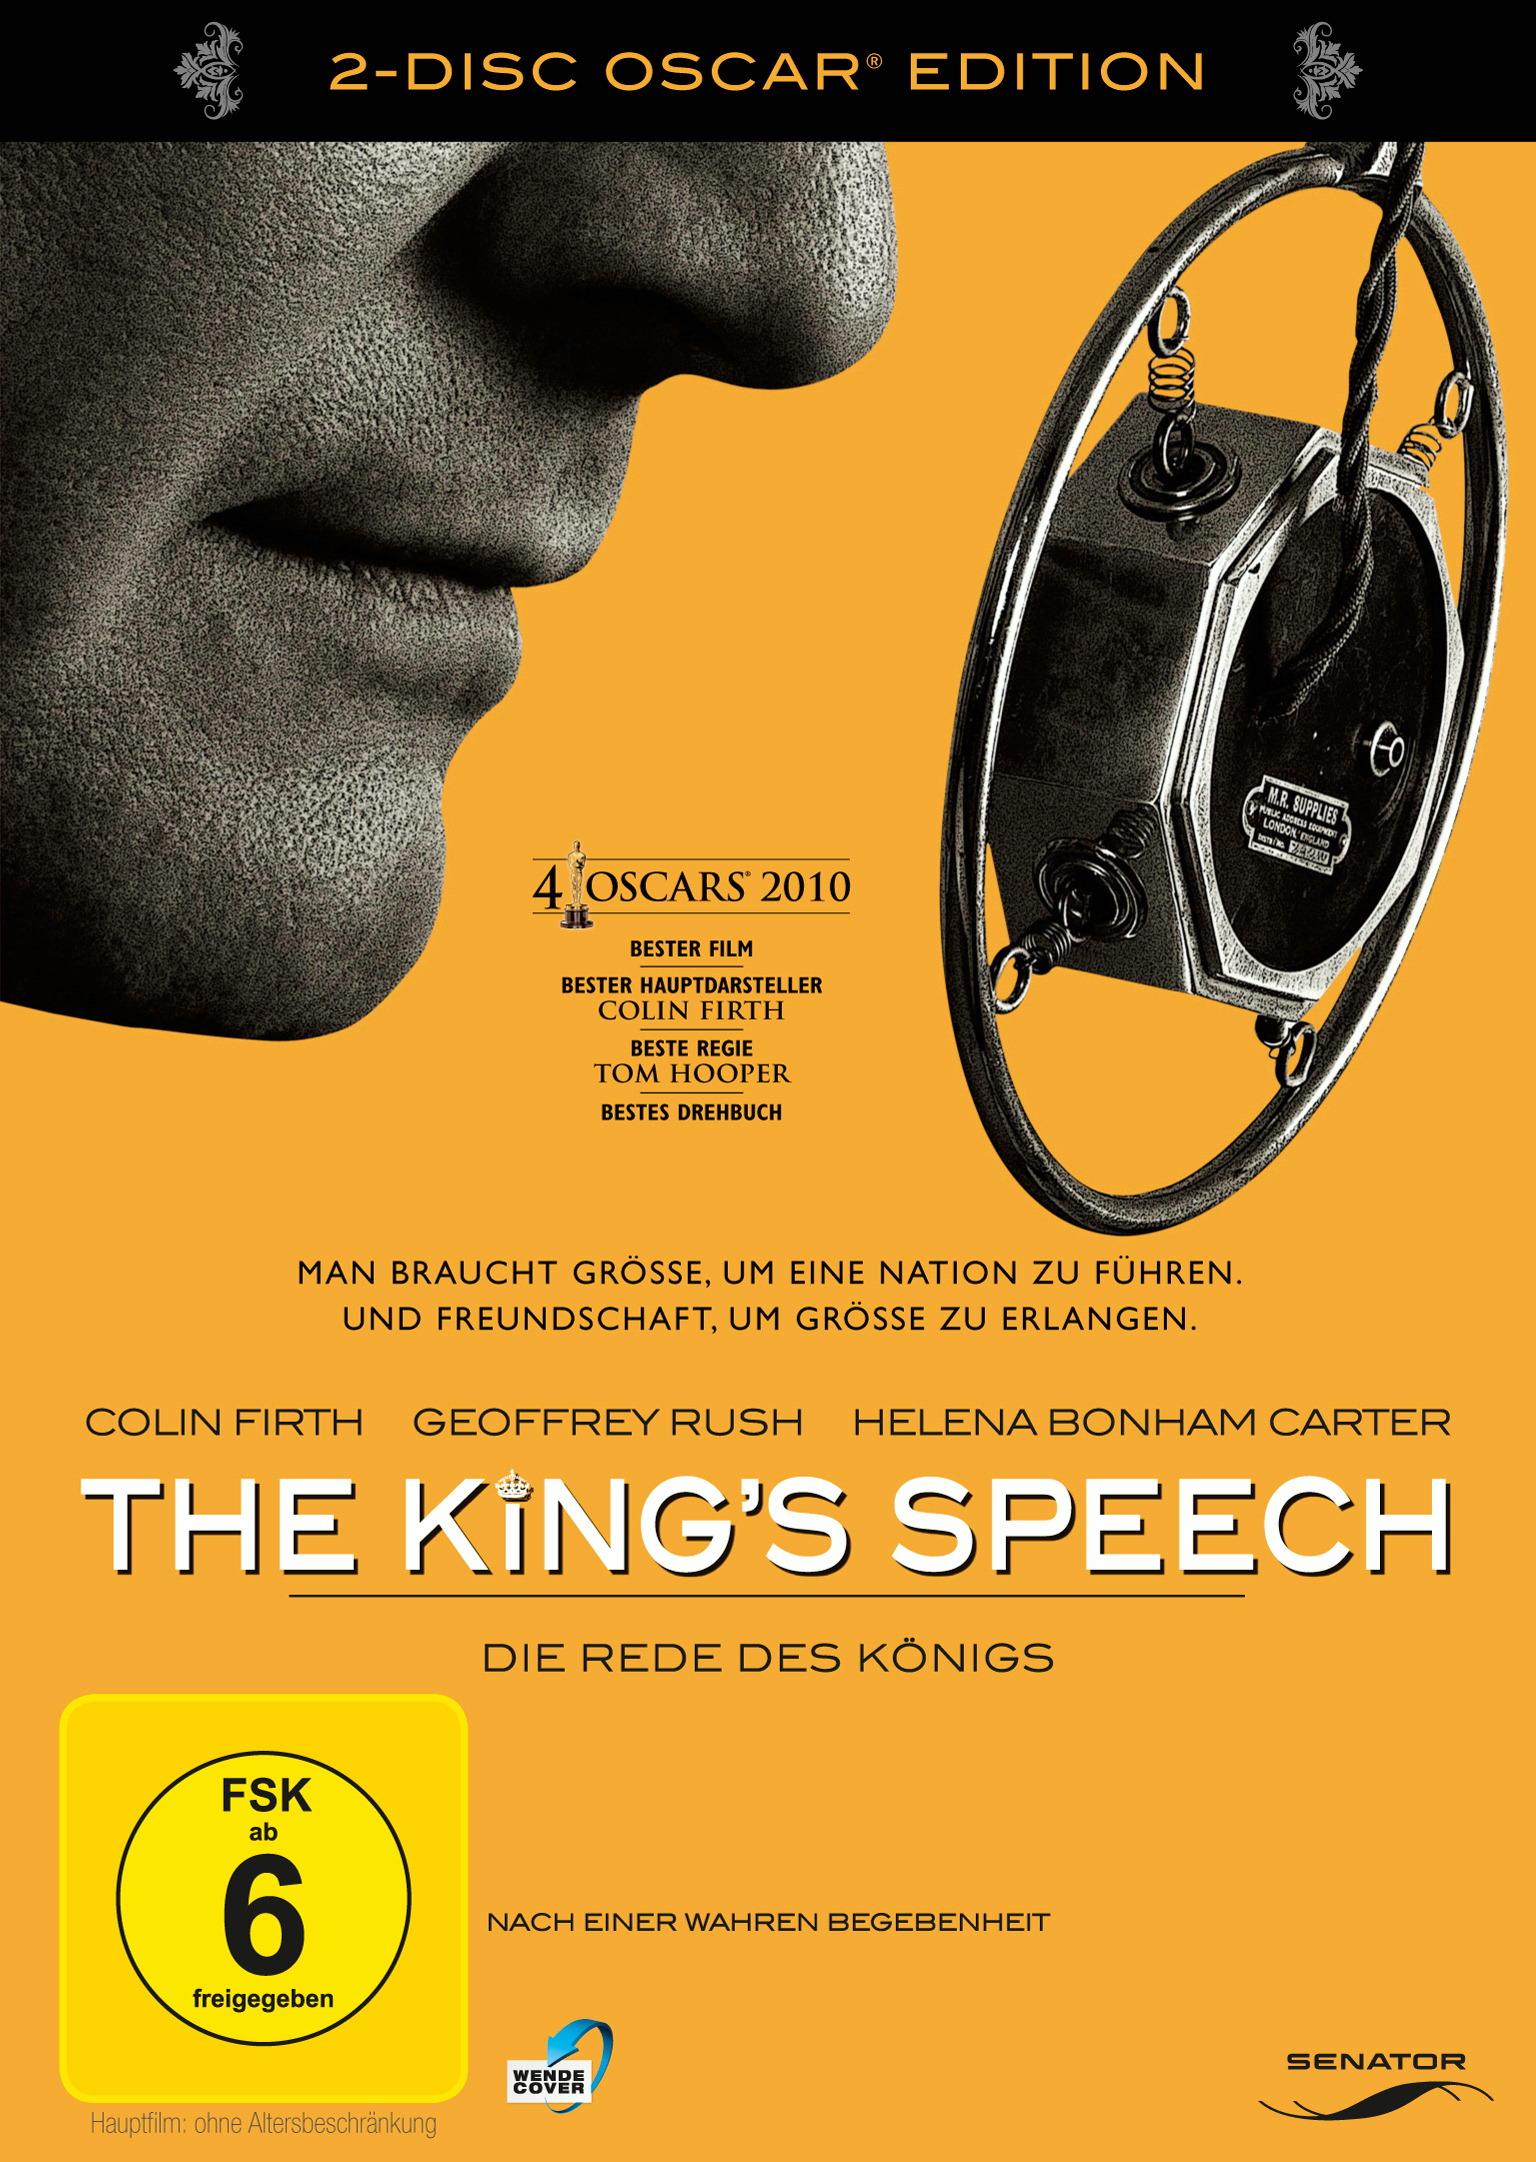 The King's Speech - Die Rede des Königs (2-Disc Oscar Edition) Poster